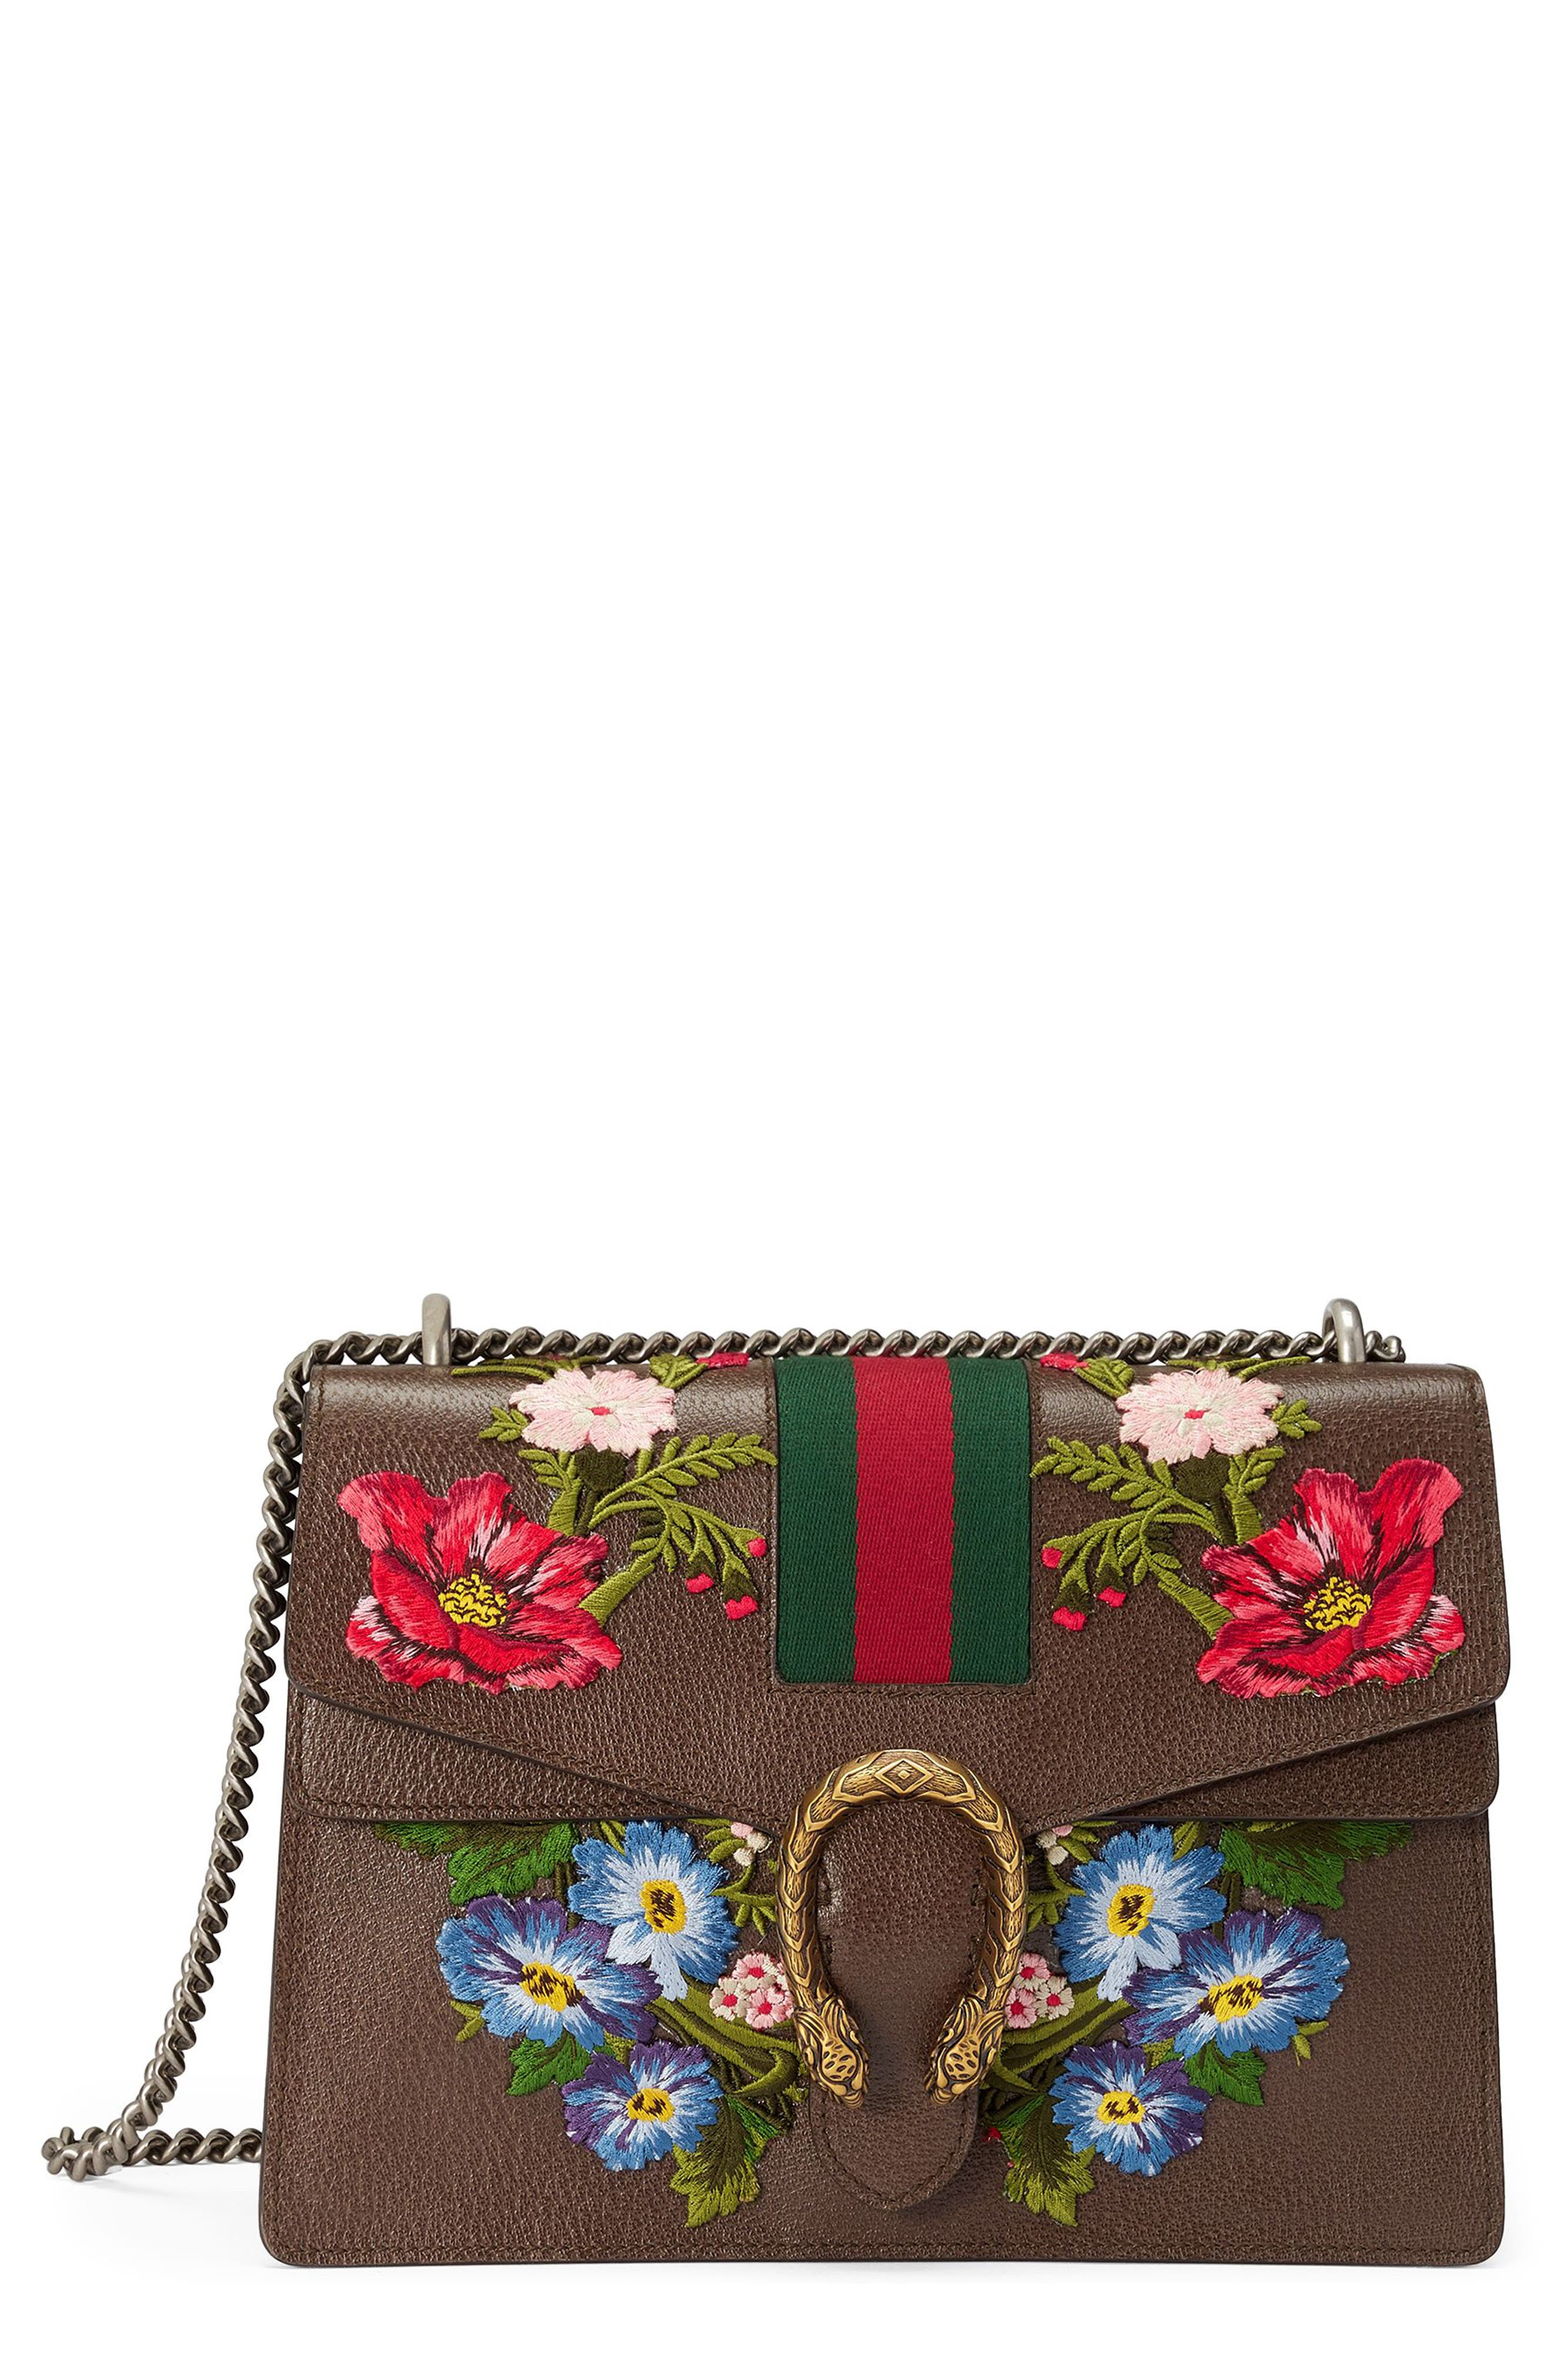 Main Image - Gucci Medium Dionysus Embroidered Leather Shoulder Bag